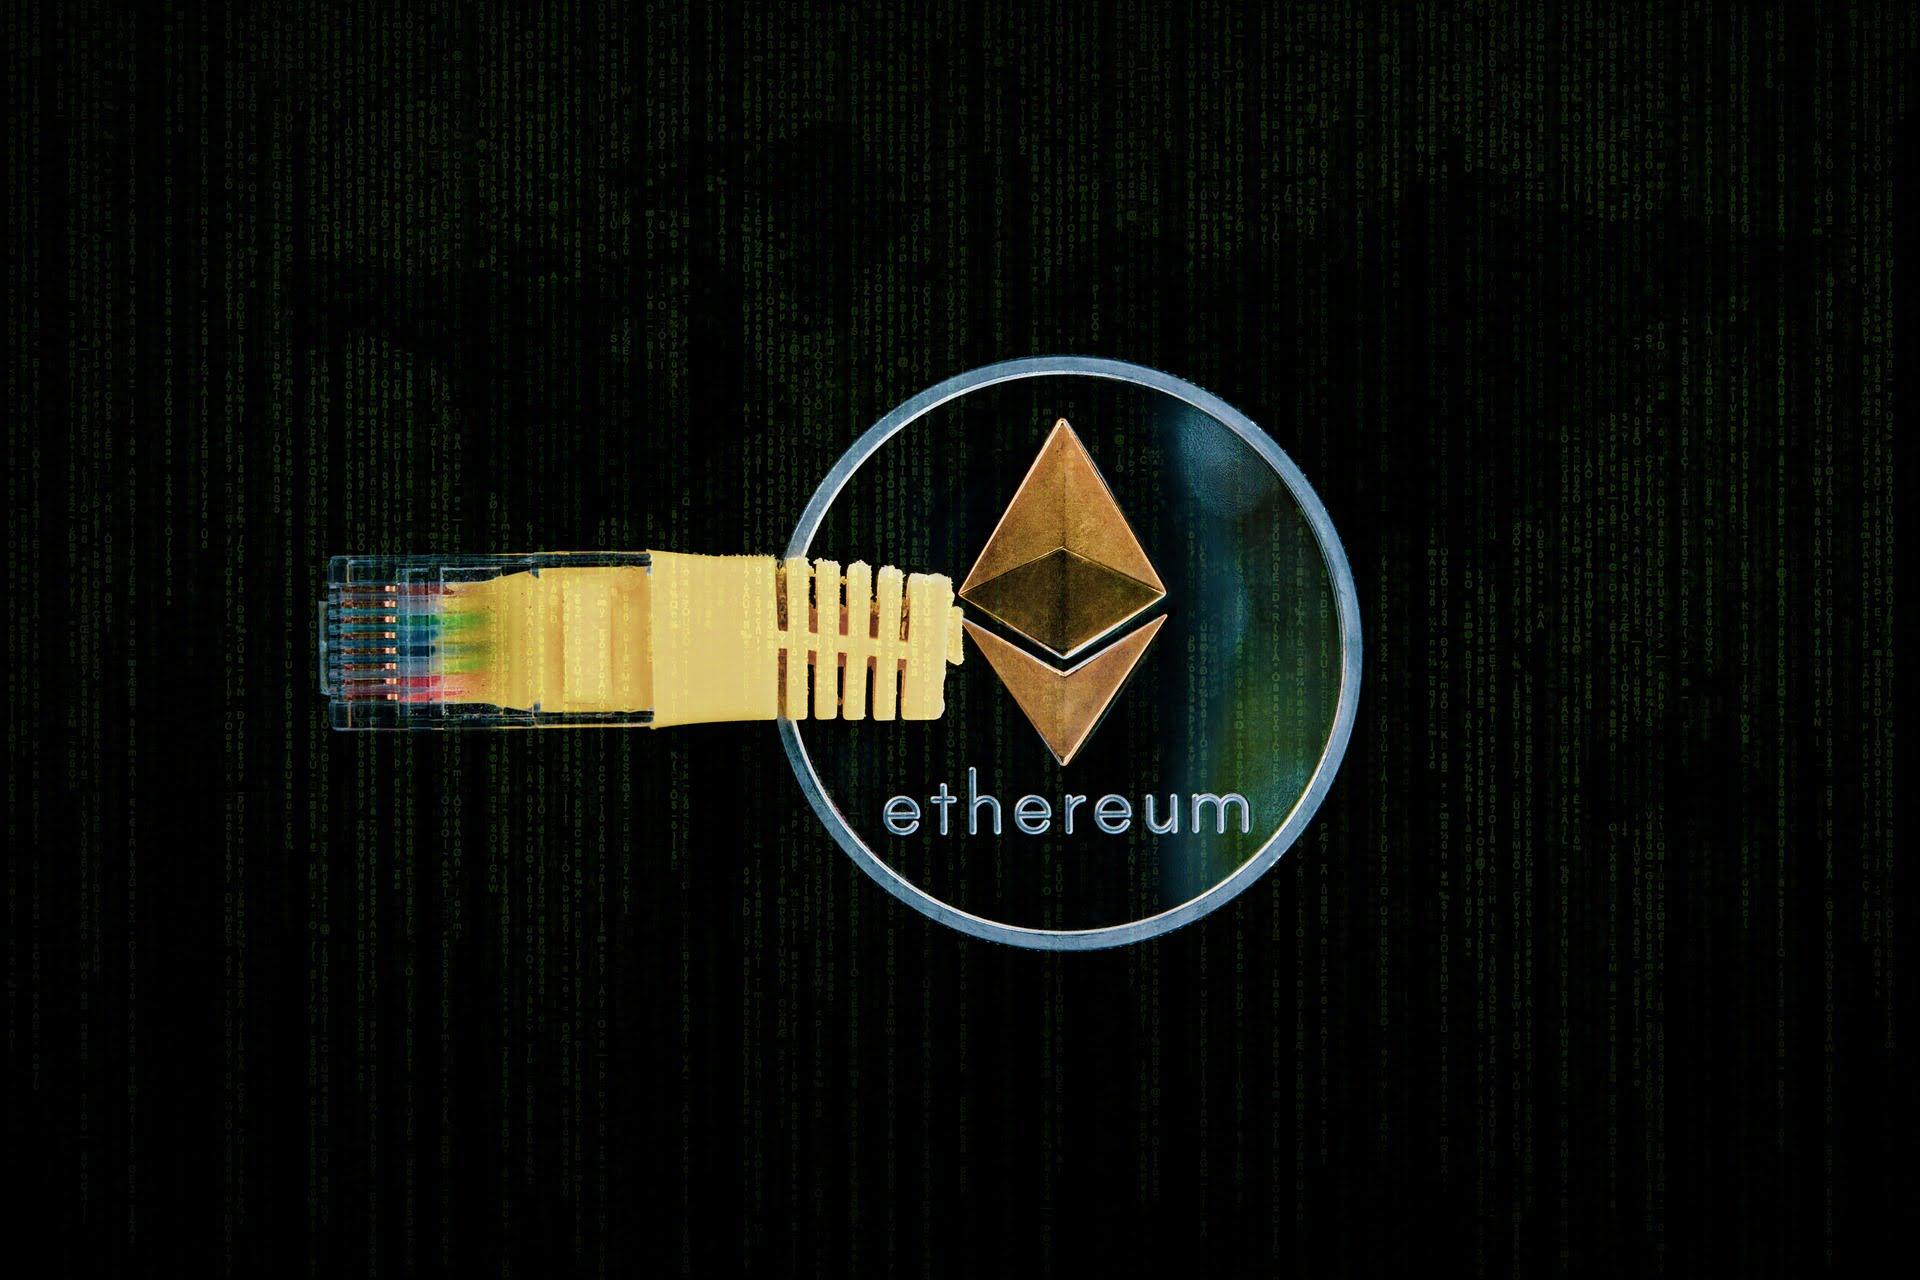 Buterin, Eth, ethereum, blockchain, IBM